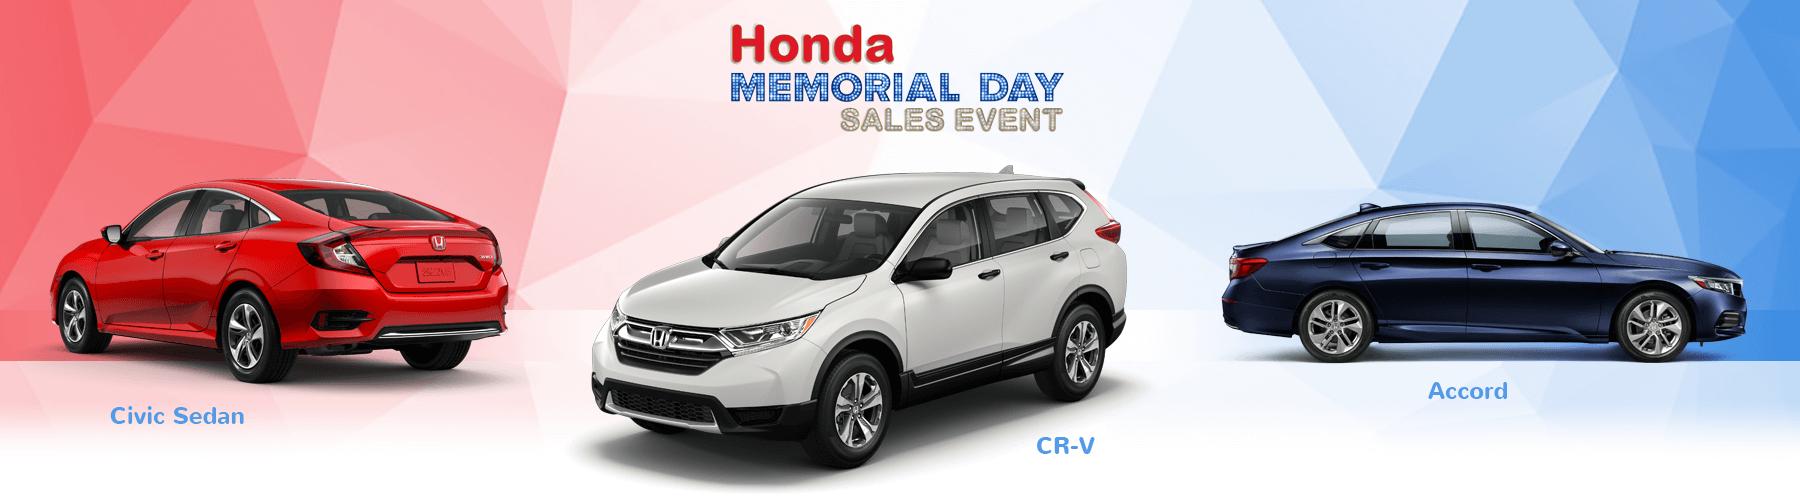 2019 Honda Memorial Day Sales Event Slider